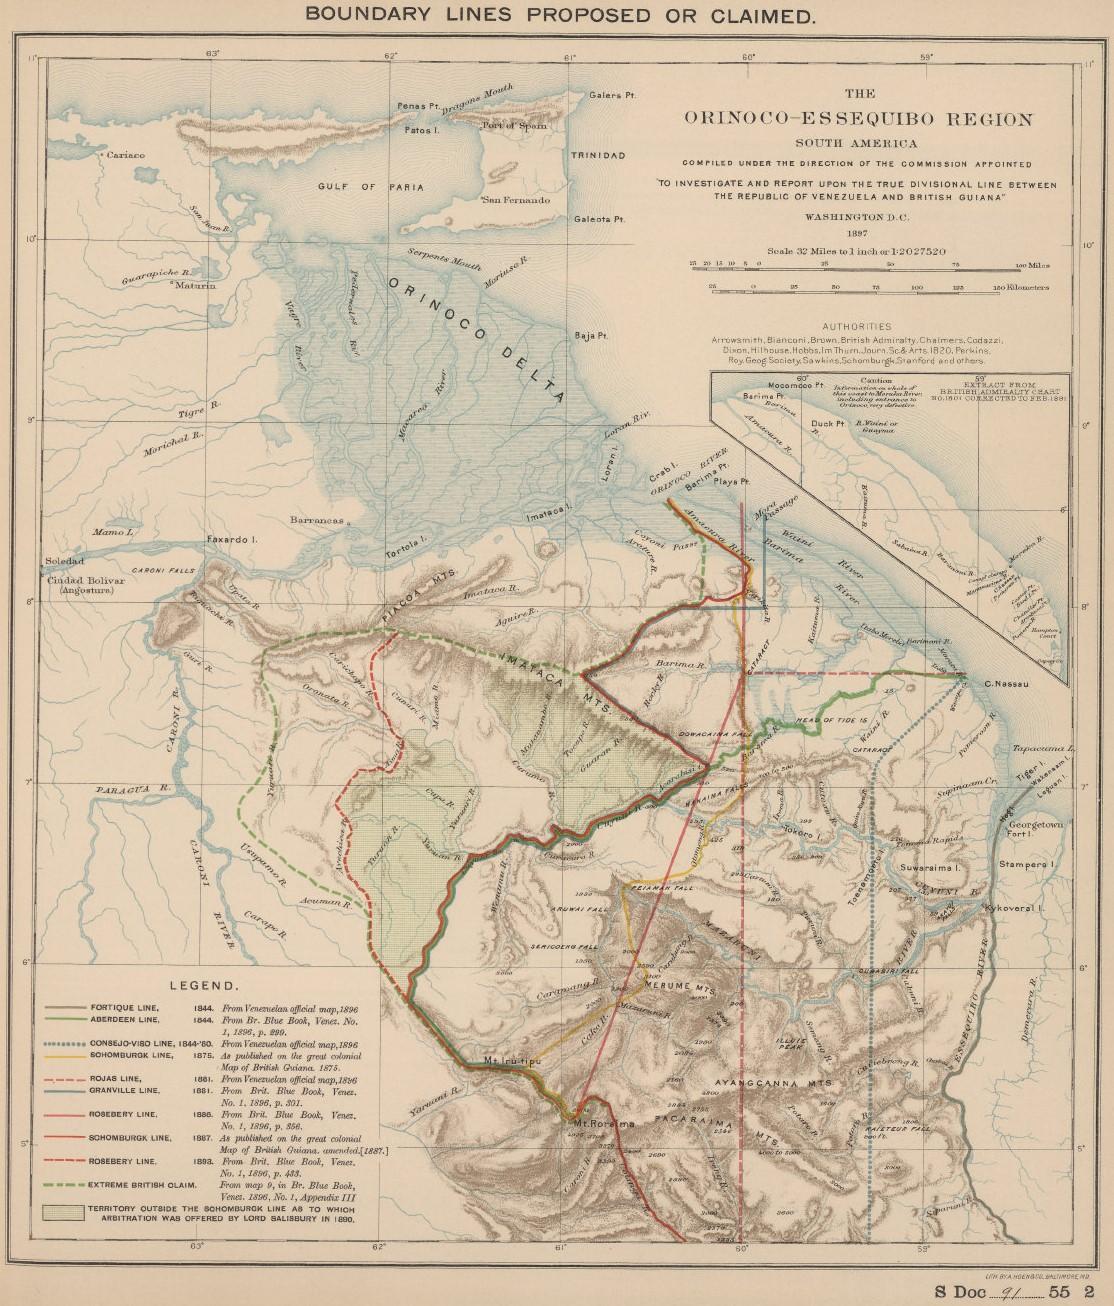 Venezuela-British Guiana Boundary Lines Proposed or Claimed 1897.jpg